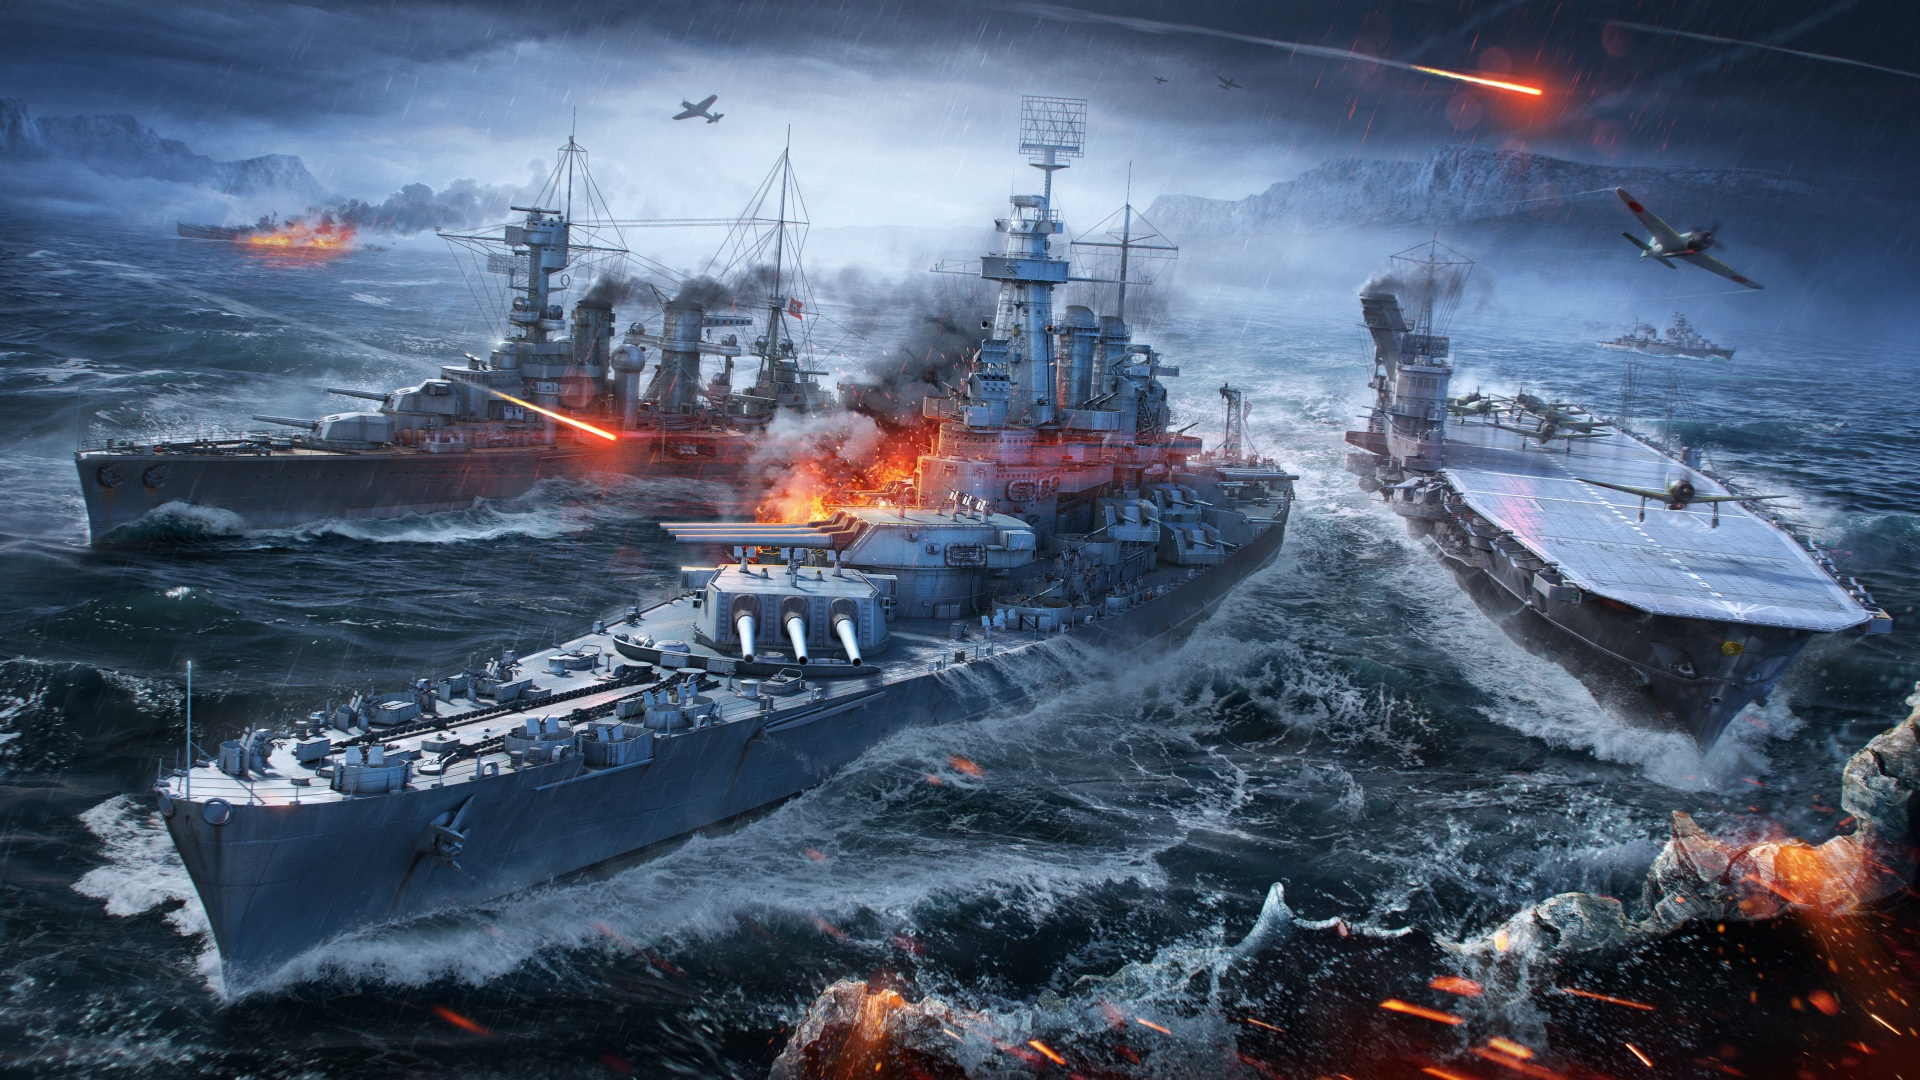 hd hintergrundbilder schiffe meer wargaming net world of warships 1920x1080